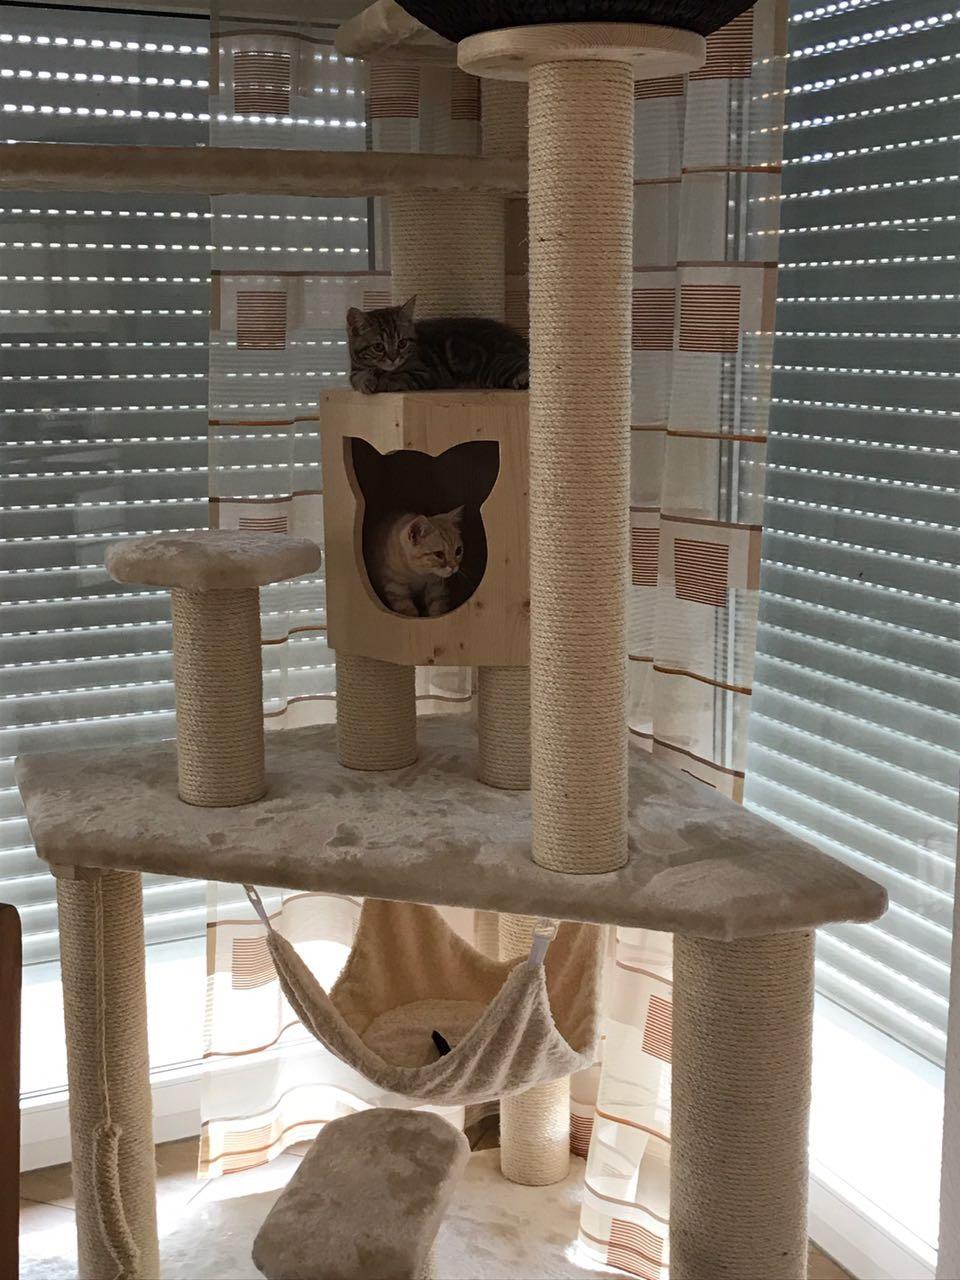 schlafbett f r katzen liegemulde h hle individuelle. Black Bedroom Furniture Sets. Home Design Ideas